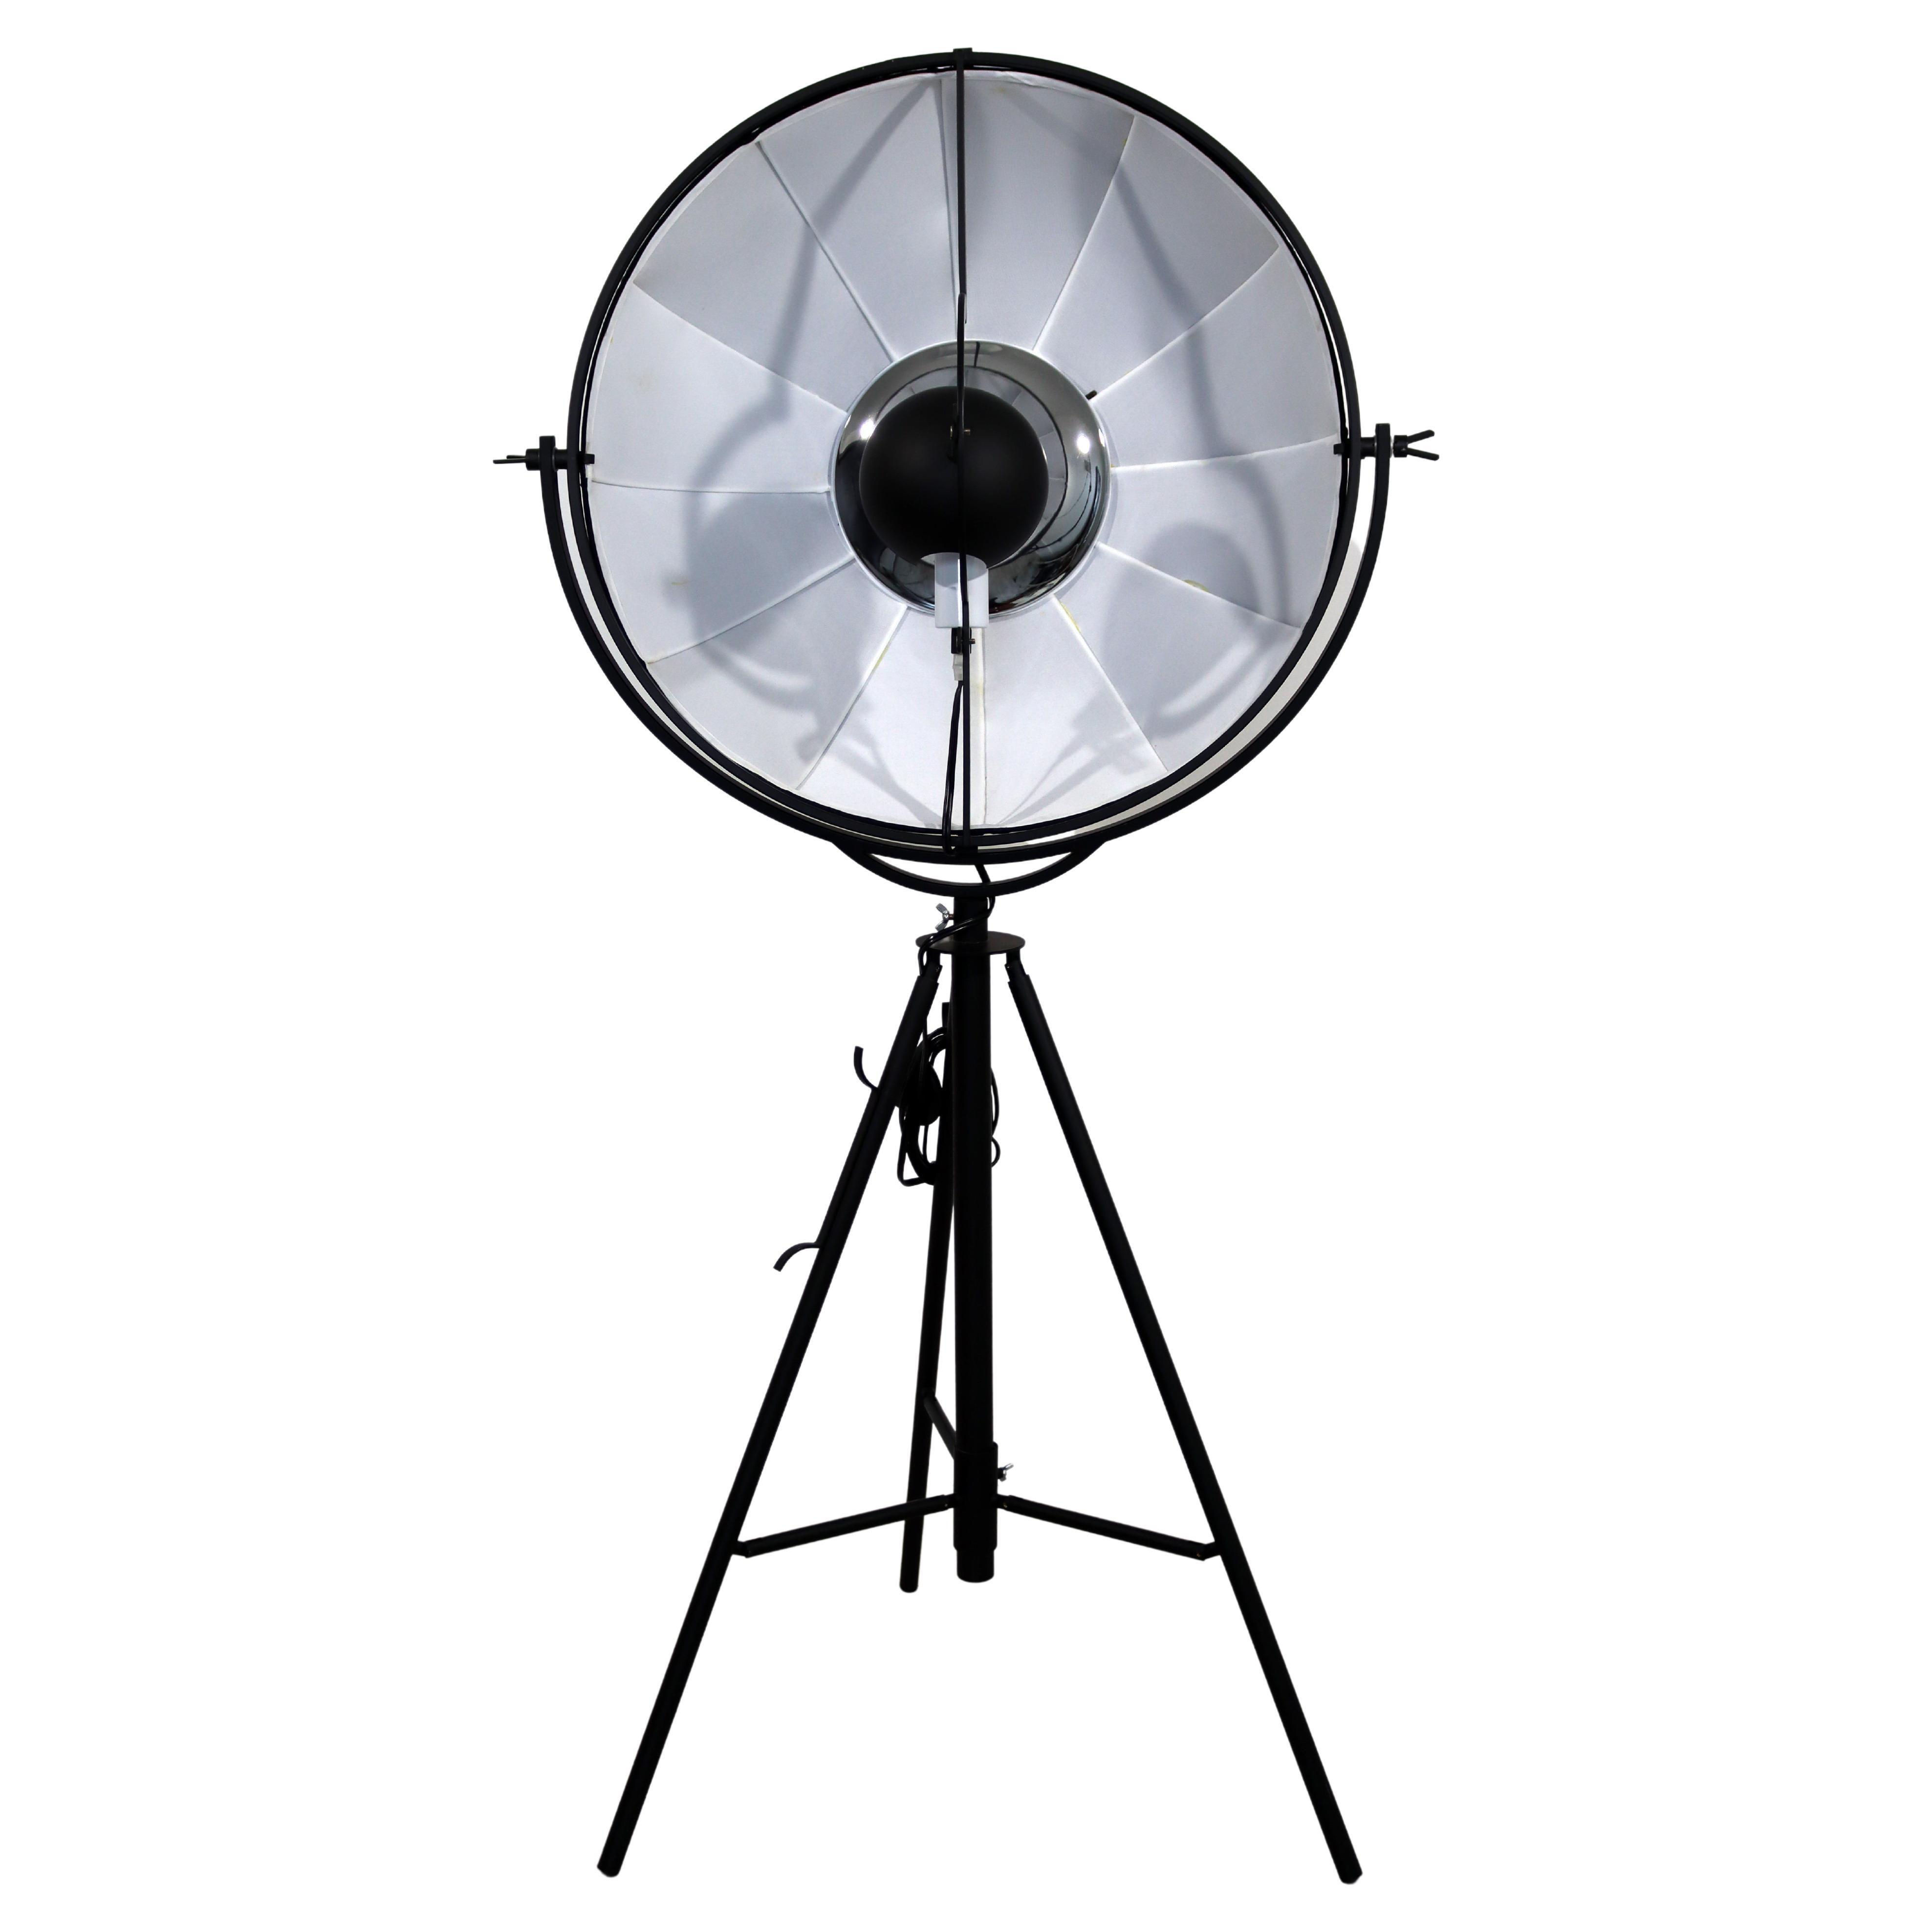 Contemporary Modern Mariano Fortuny for Palluco Italia Photographer Lamp, 1980s